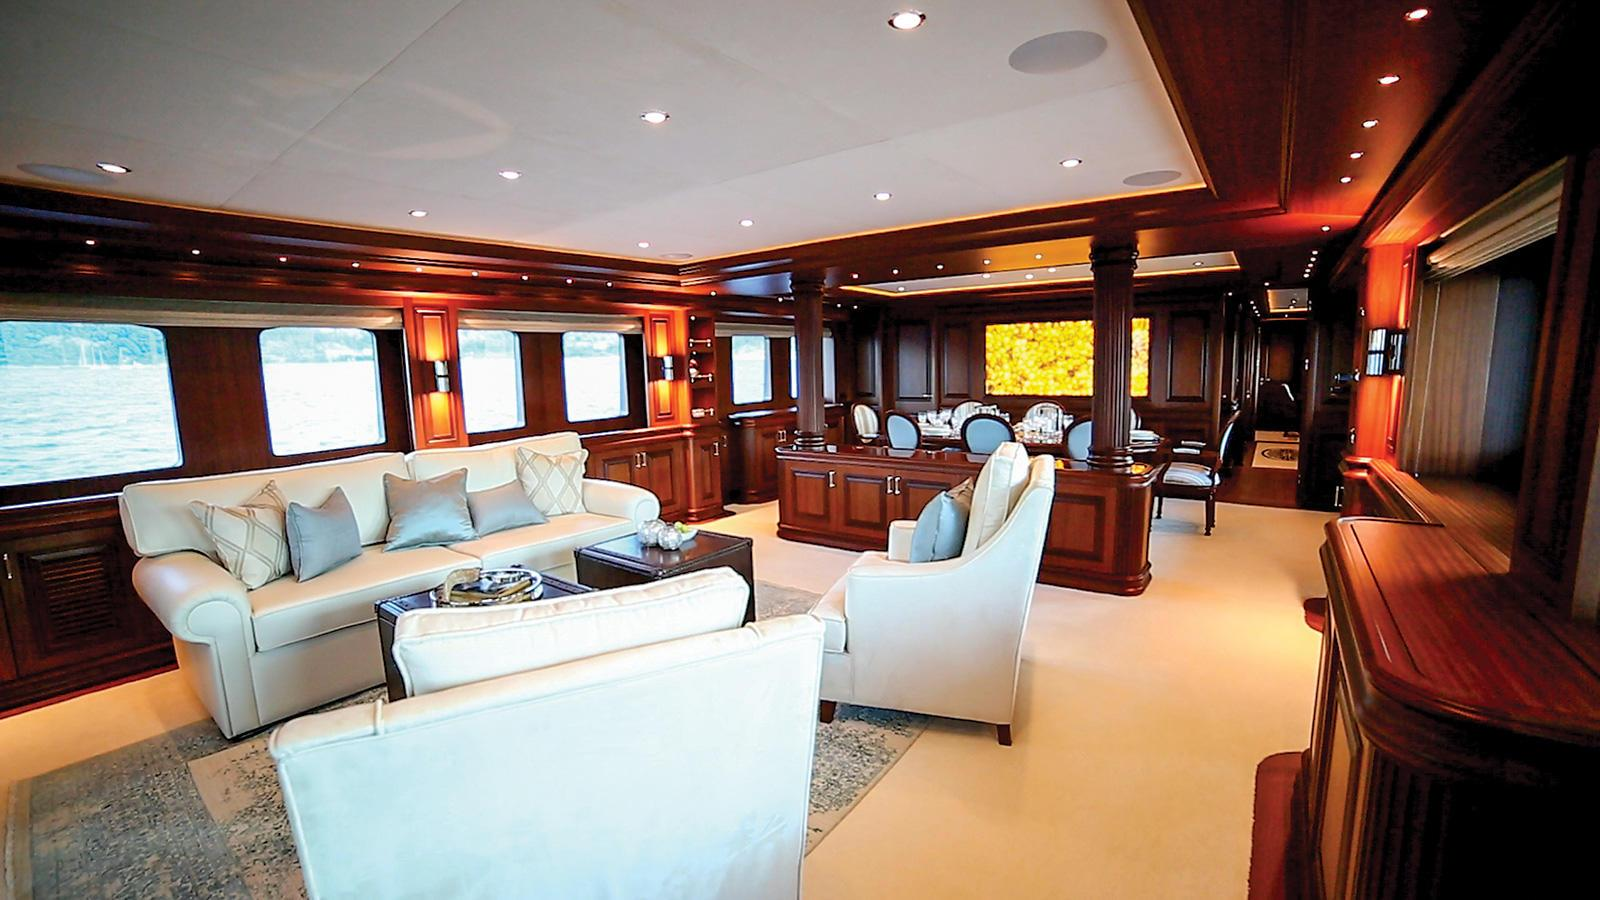 clarity-motor-yacht-bilgin-classic-160-2015-49m-upper-lounge